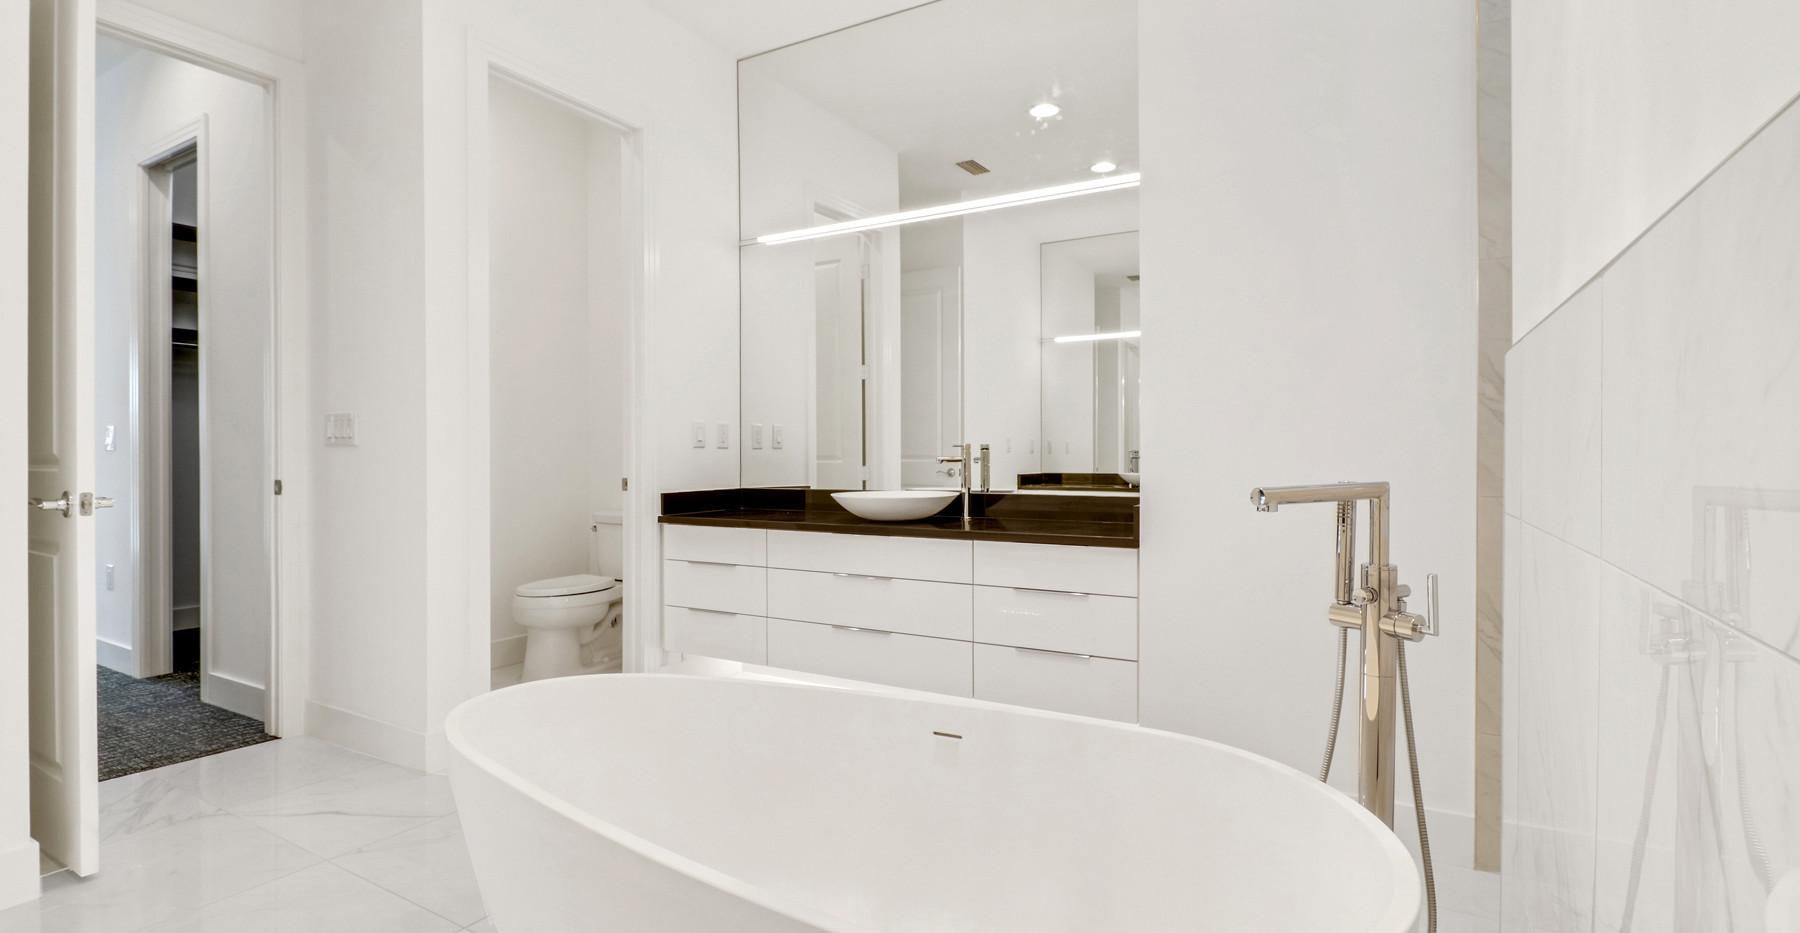 Jamaica Court home in Marco island interior master bath